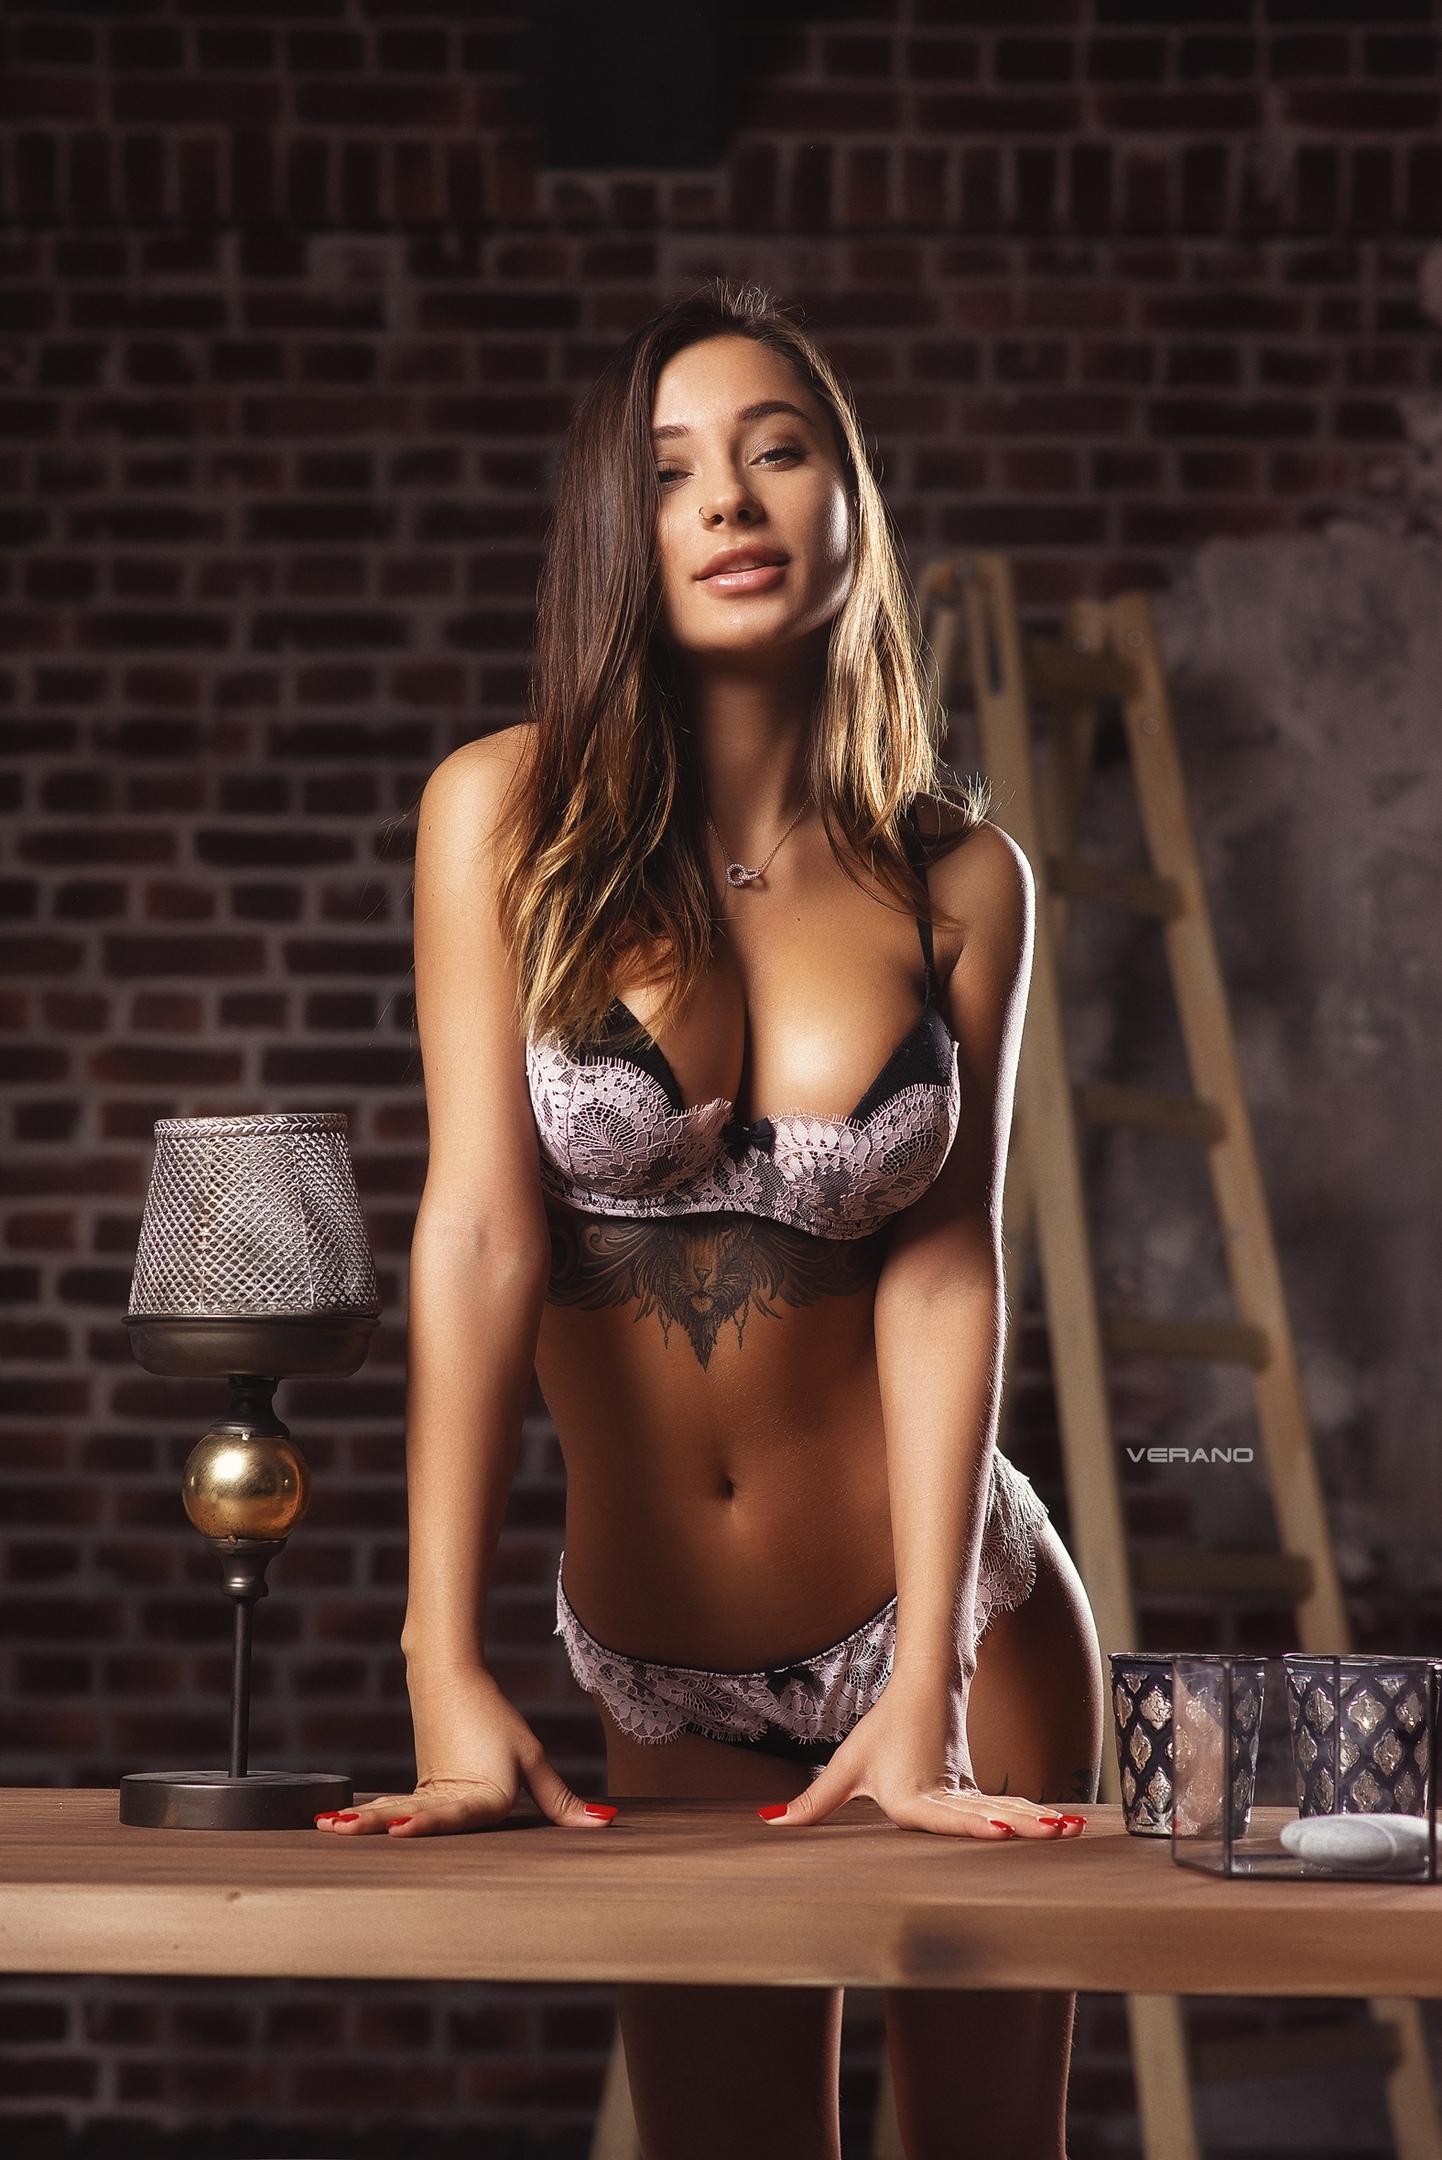 Kristina Shcherbinina nudes (37 fotos), pictures Tits, Snapchat, legs 2019